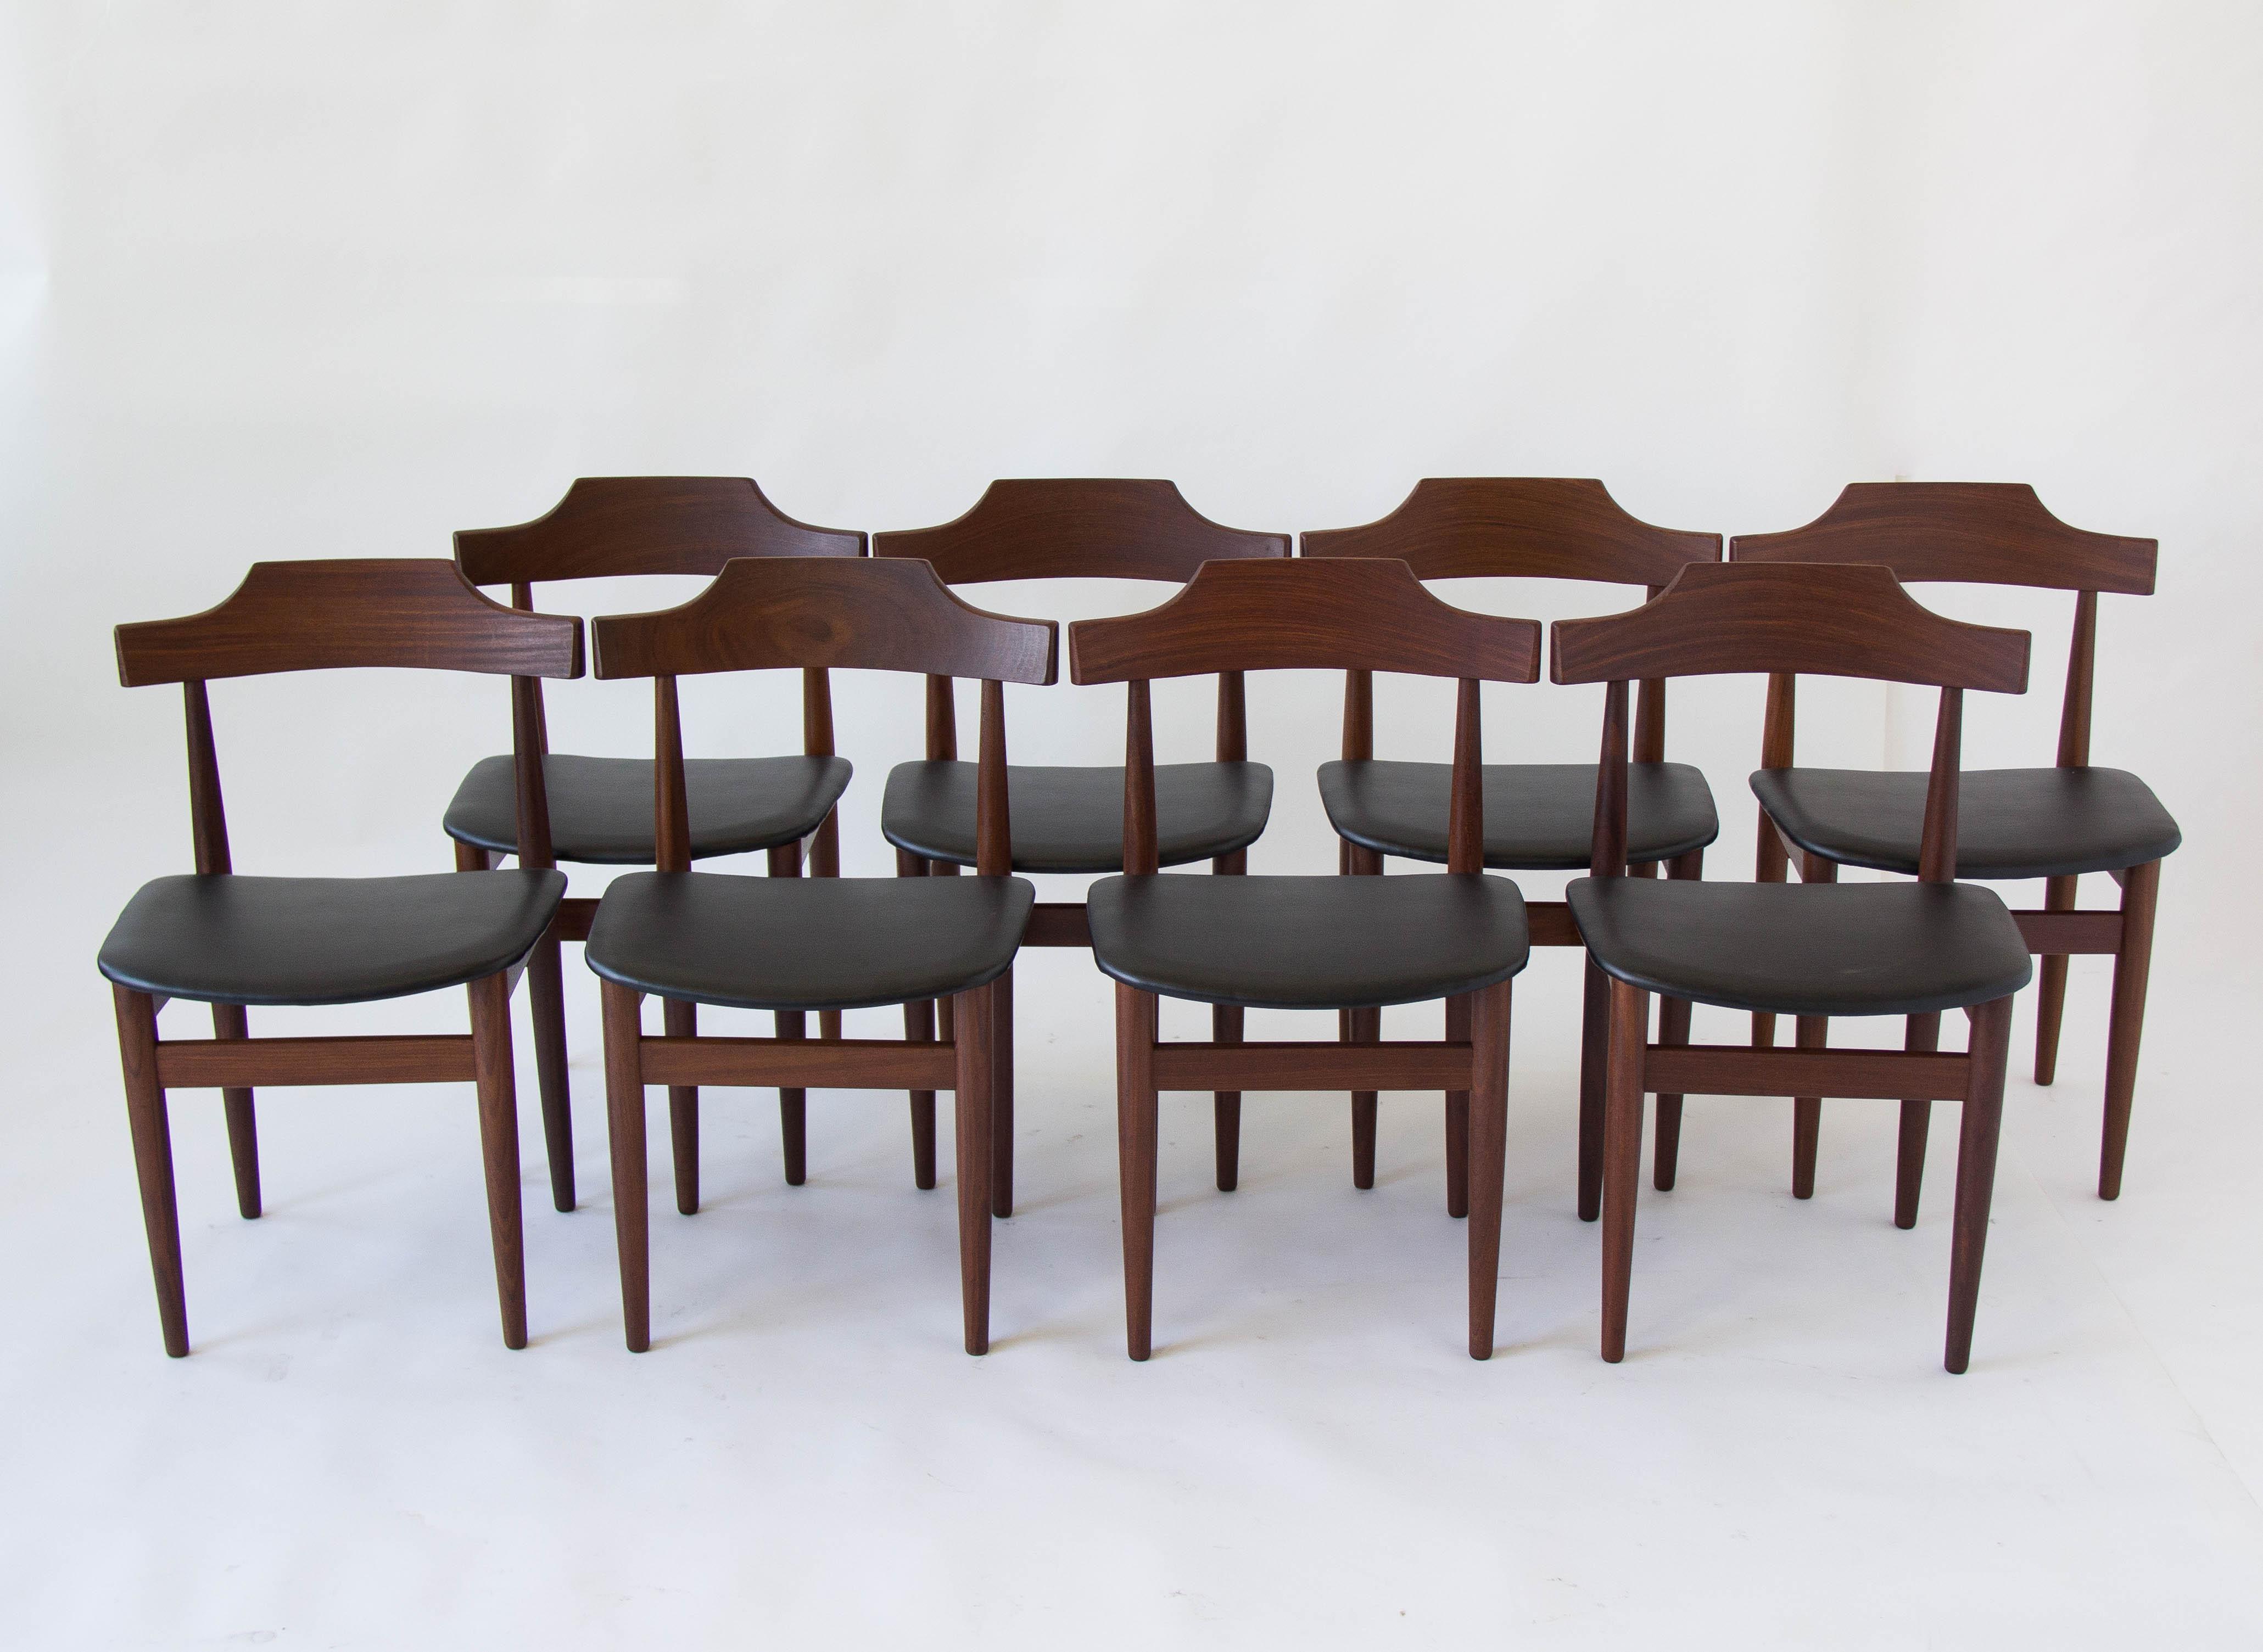 Eight Seat Dining Set By Hans Olsen For Frem Rojle   Image 8 Of 11